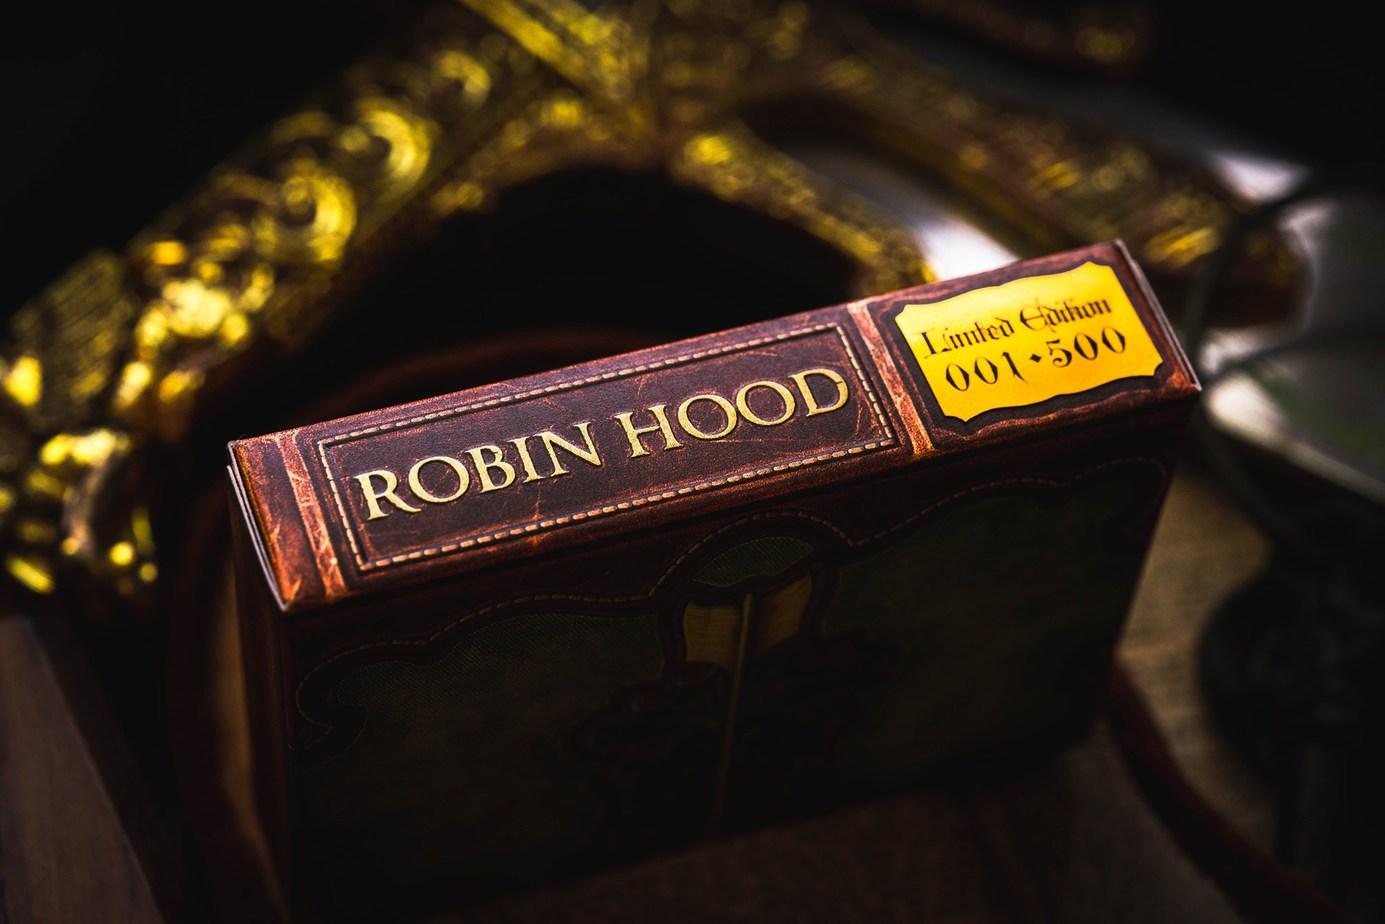 robin hood themed deck of custom playing cards